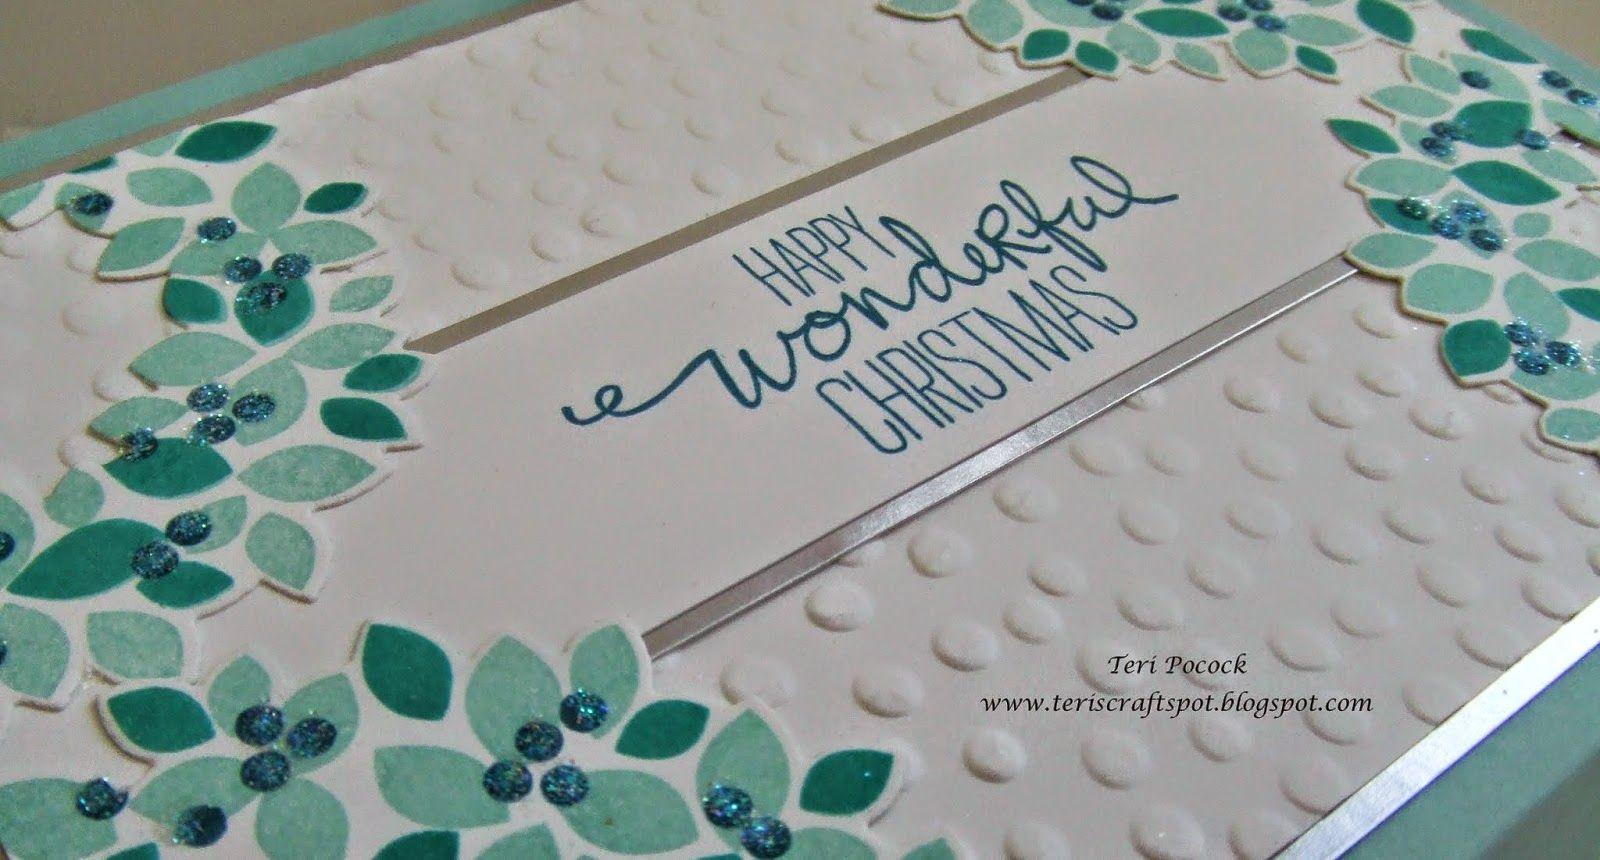 Wondrous wreath christmas card set wondrous wreath wreaths and